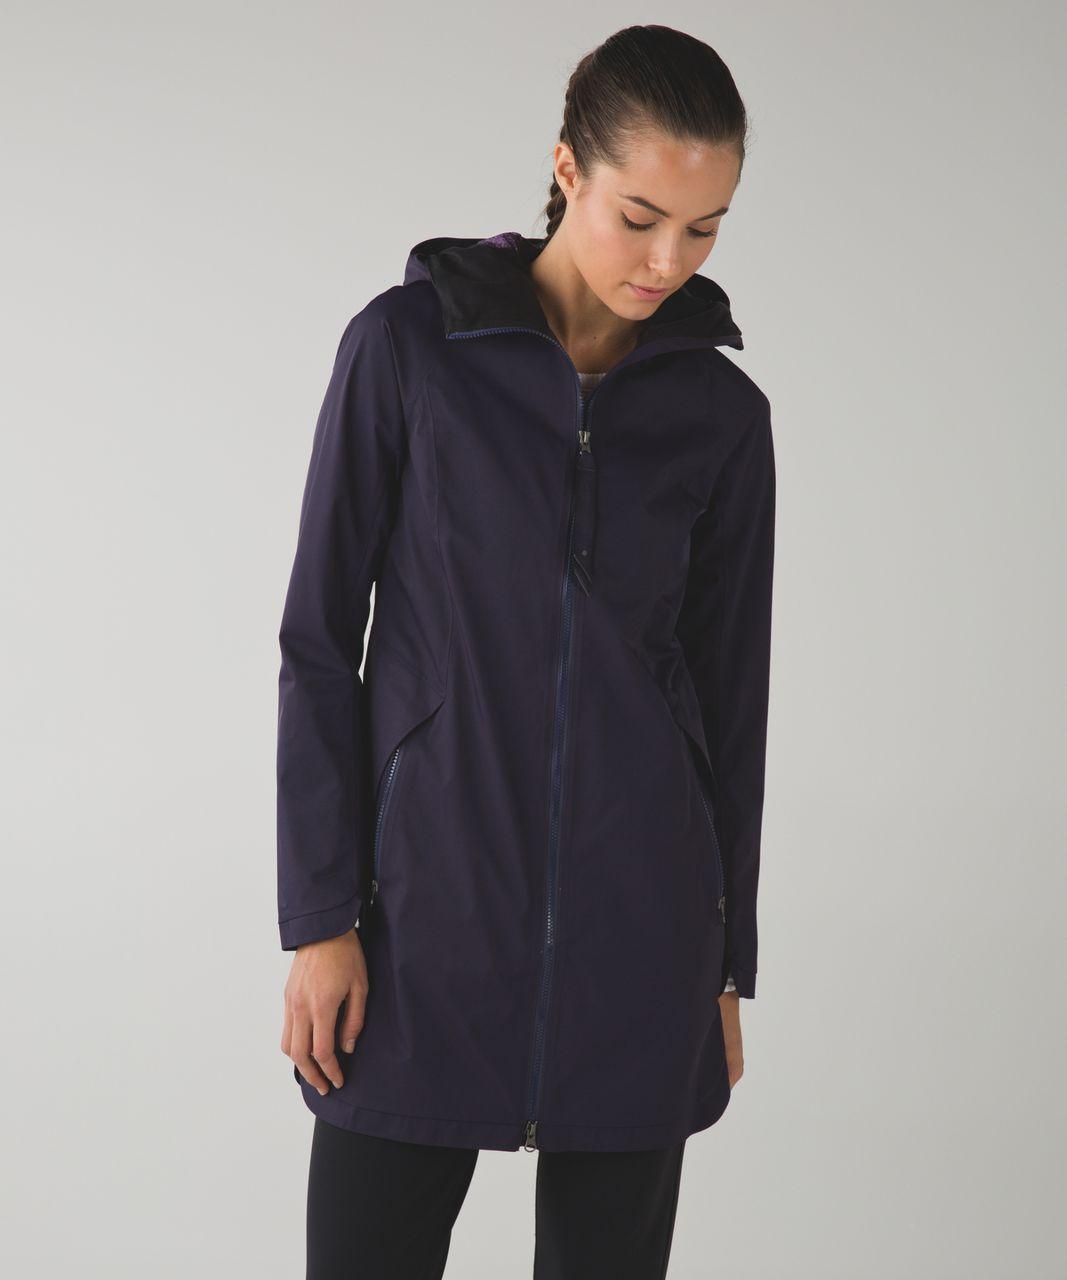 Lululemon Definitely Raining Jacket - Black Grape